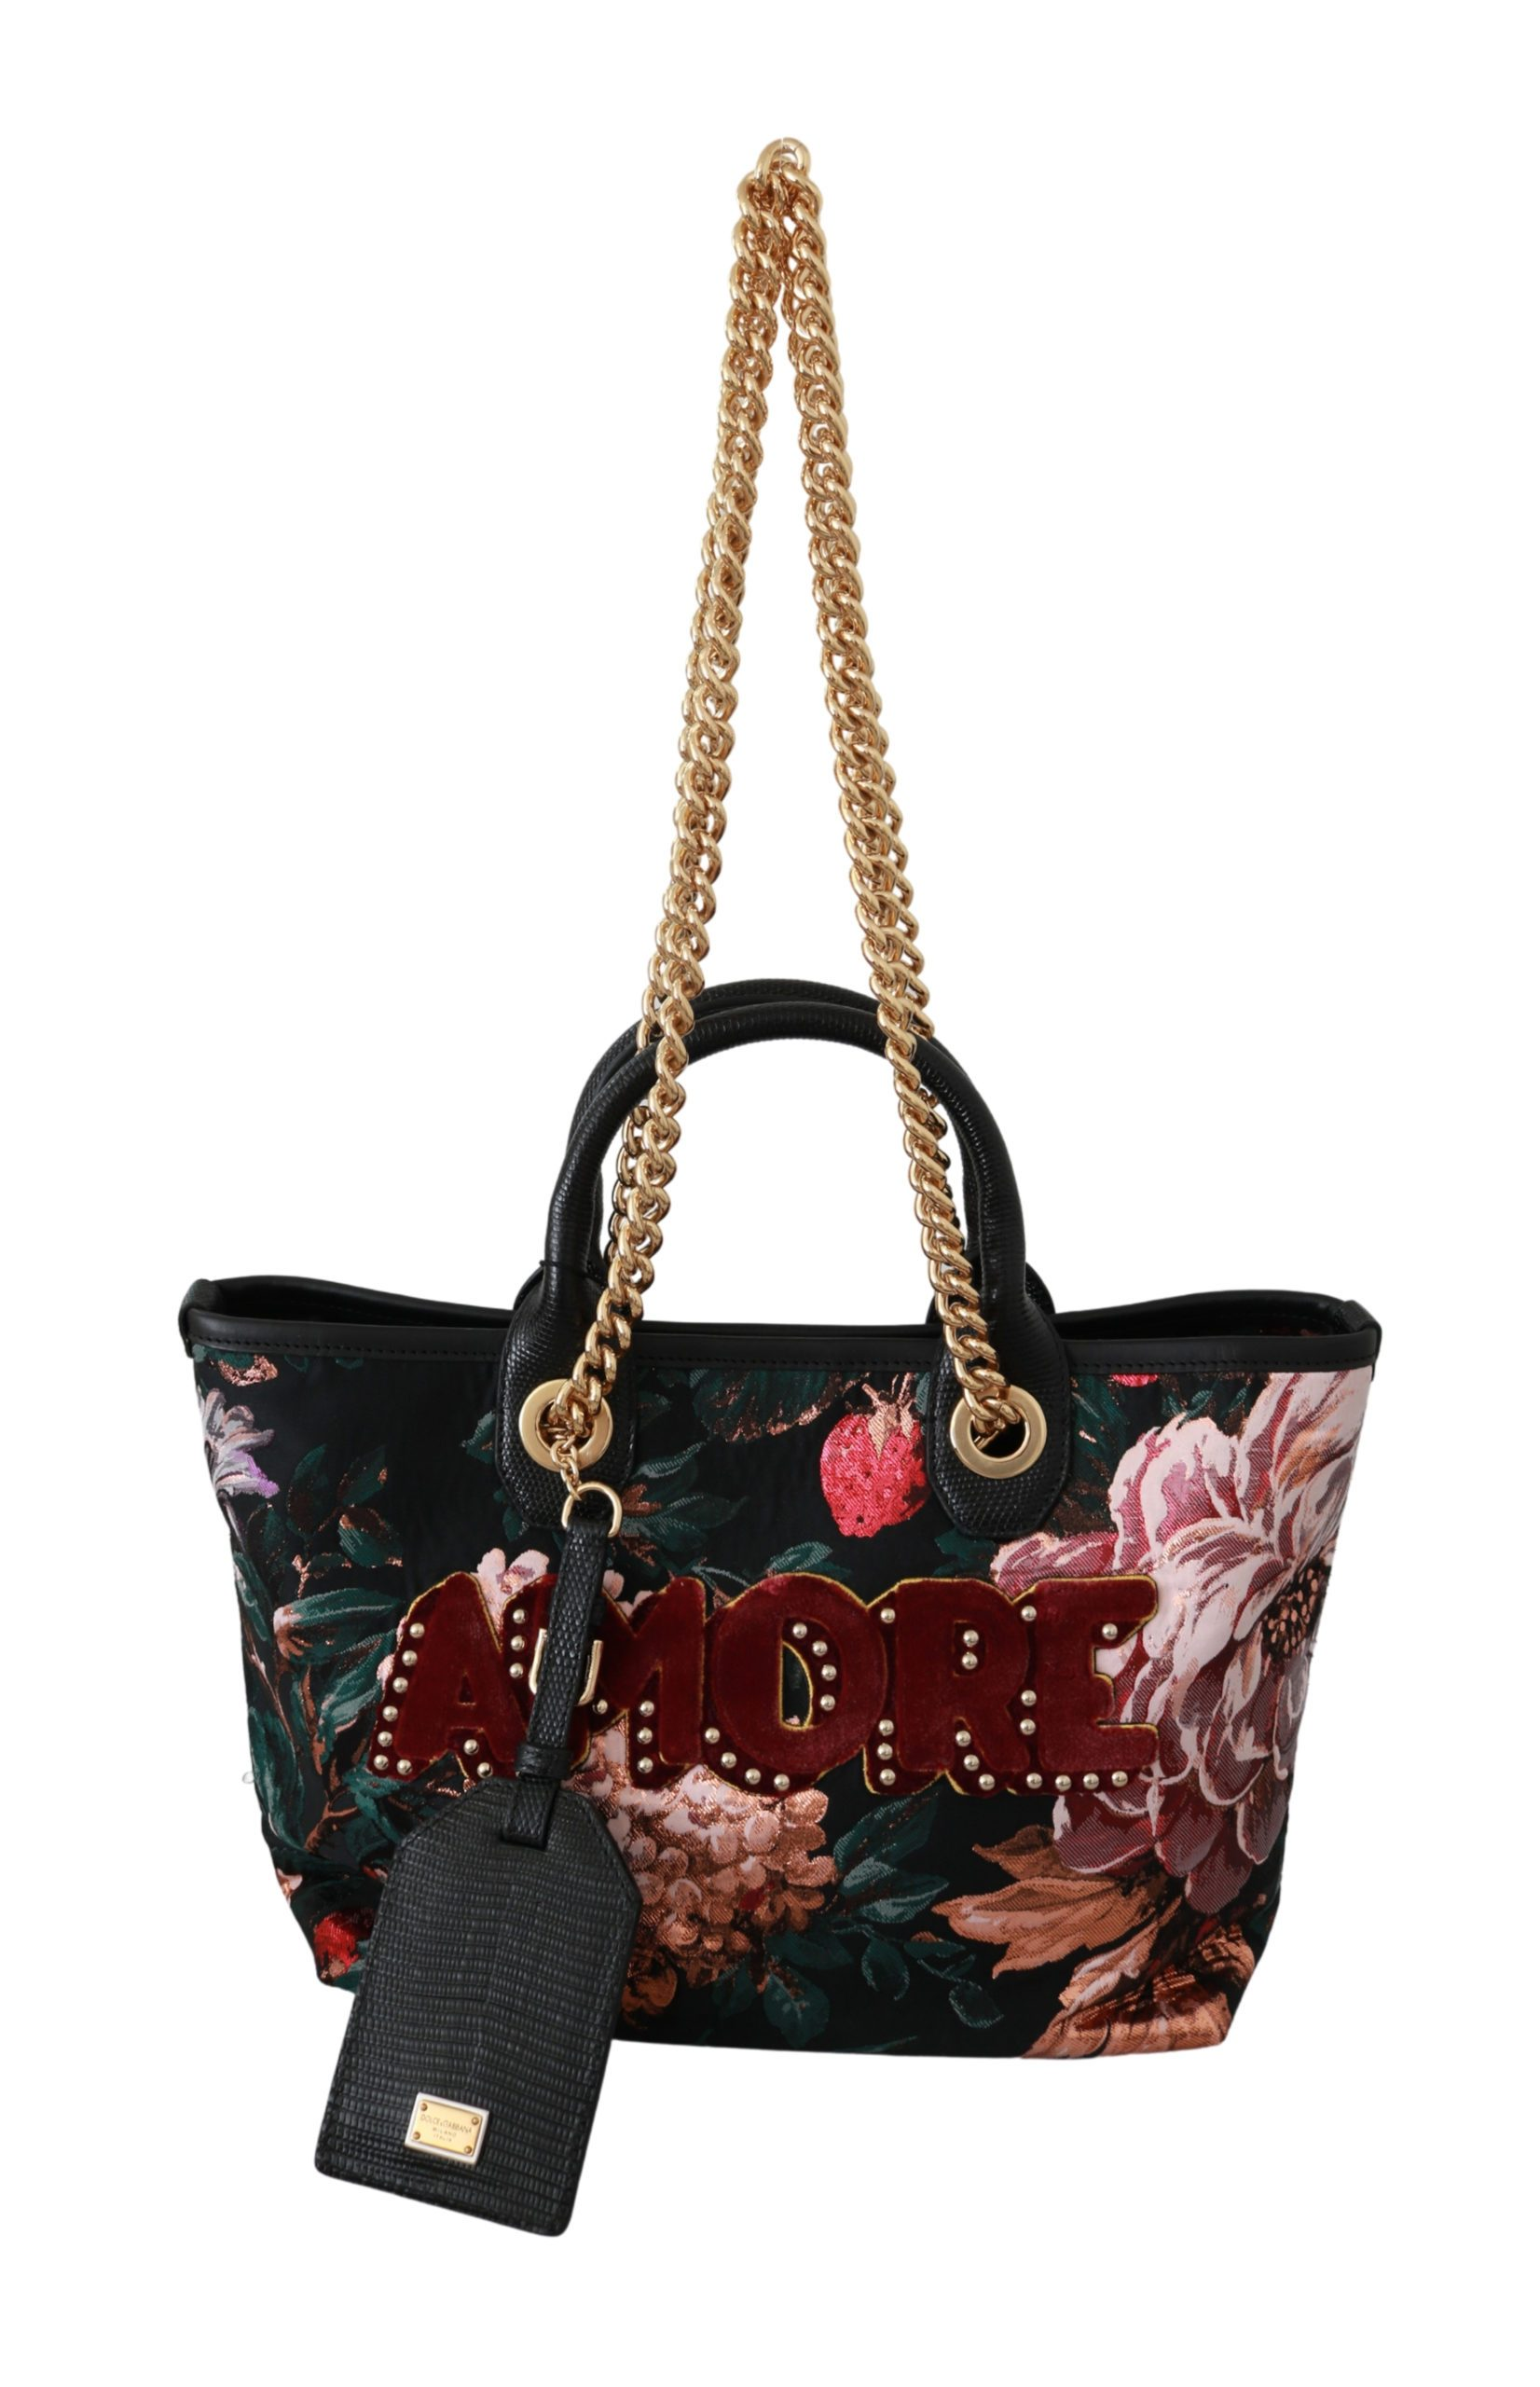 Dolce & Gabbana Women's Floral Amore VAS9225 Patch Tote CAPRI Bag Black